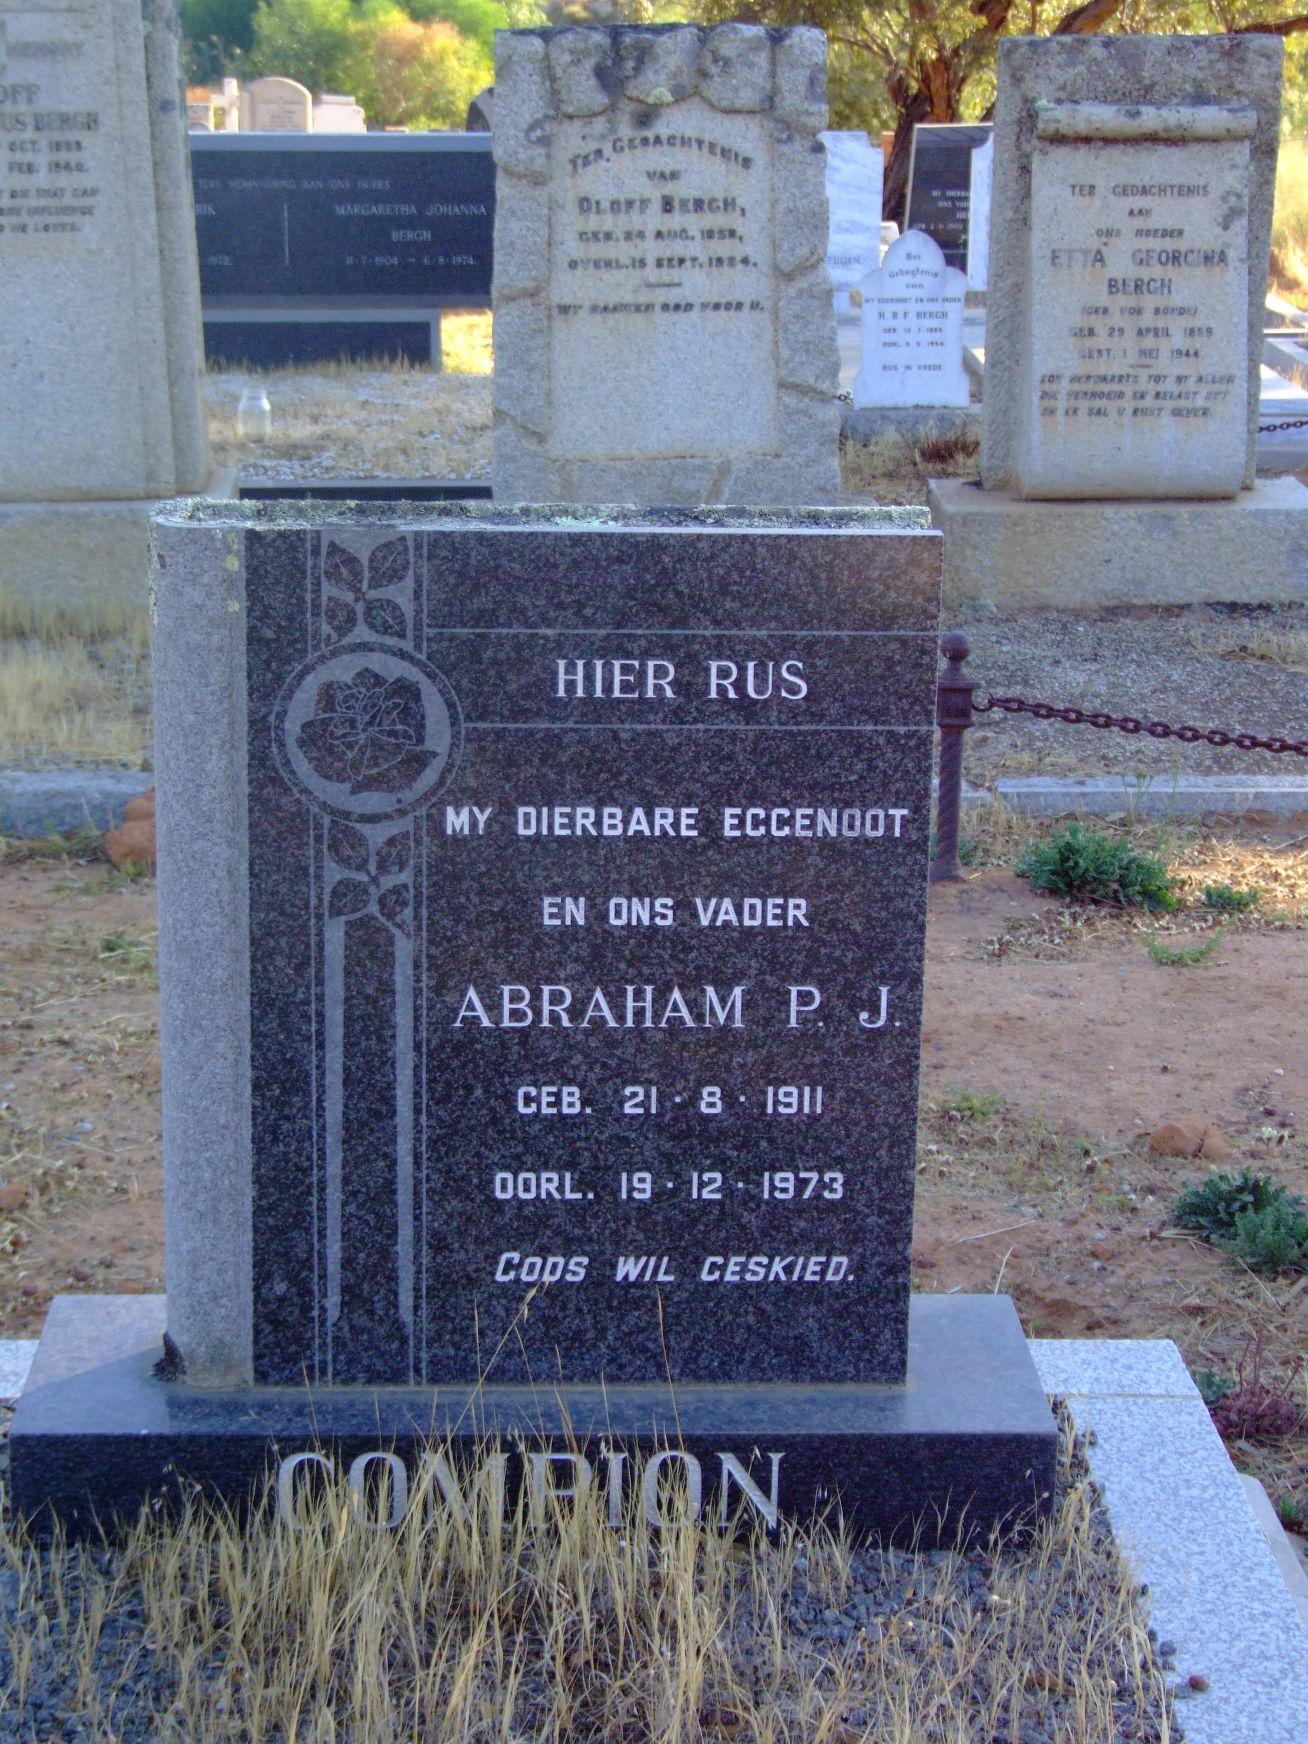 Compion, Abraham P J